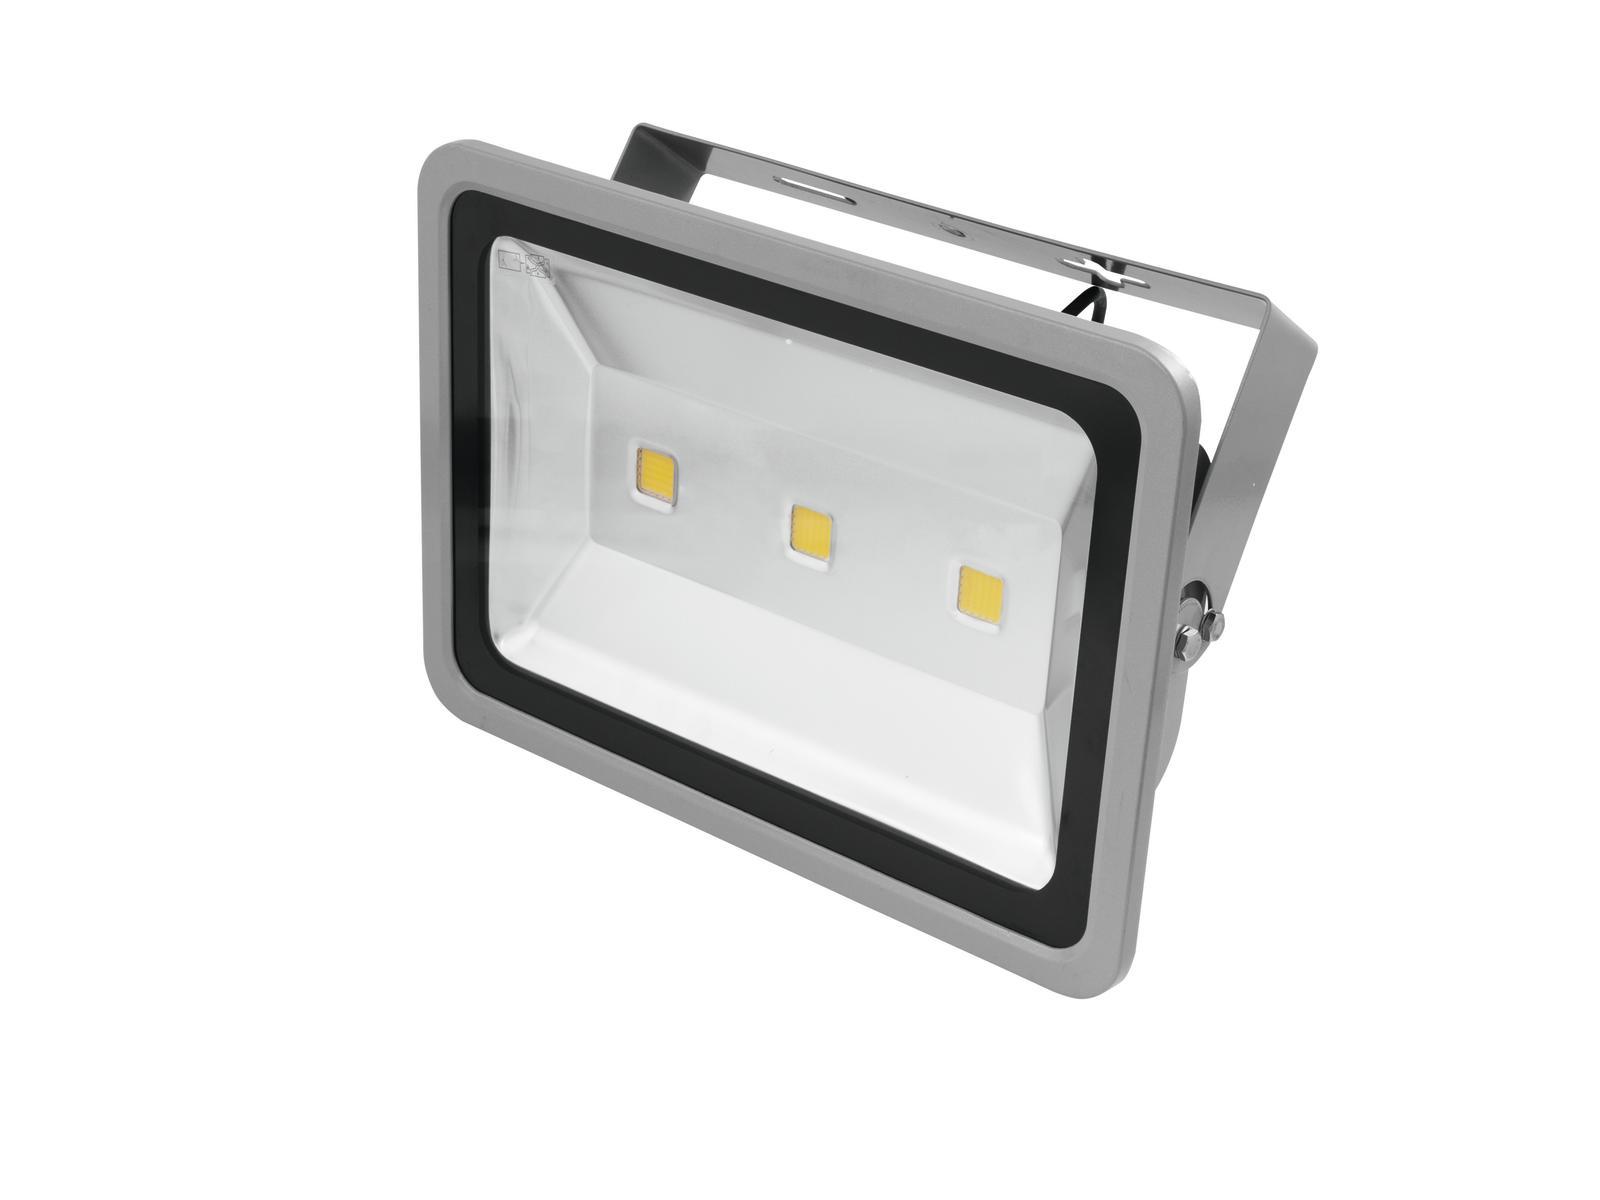 EUROLITE LED IP FL-150 COB 3000K 120°faro luce proiettore con tecnologia a LED